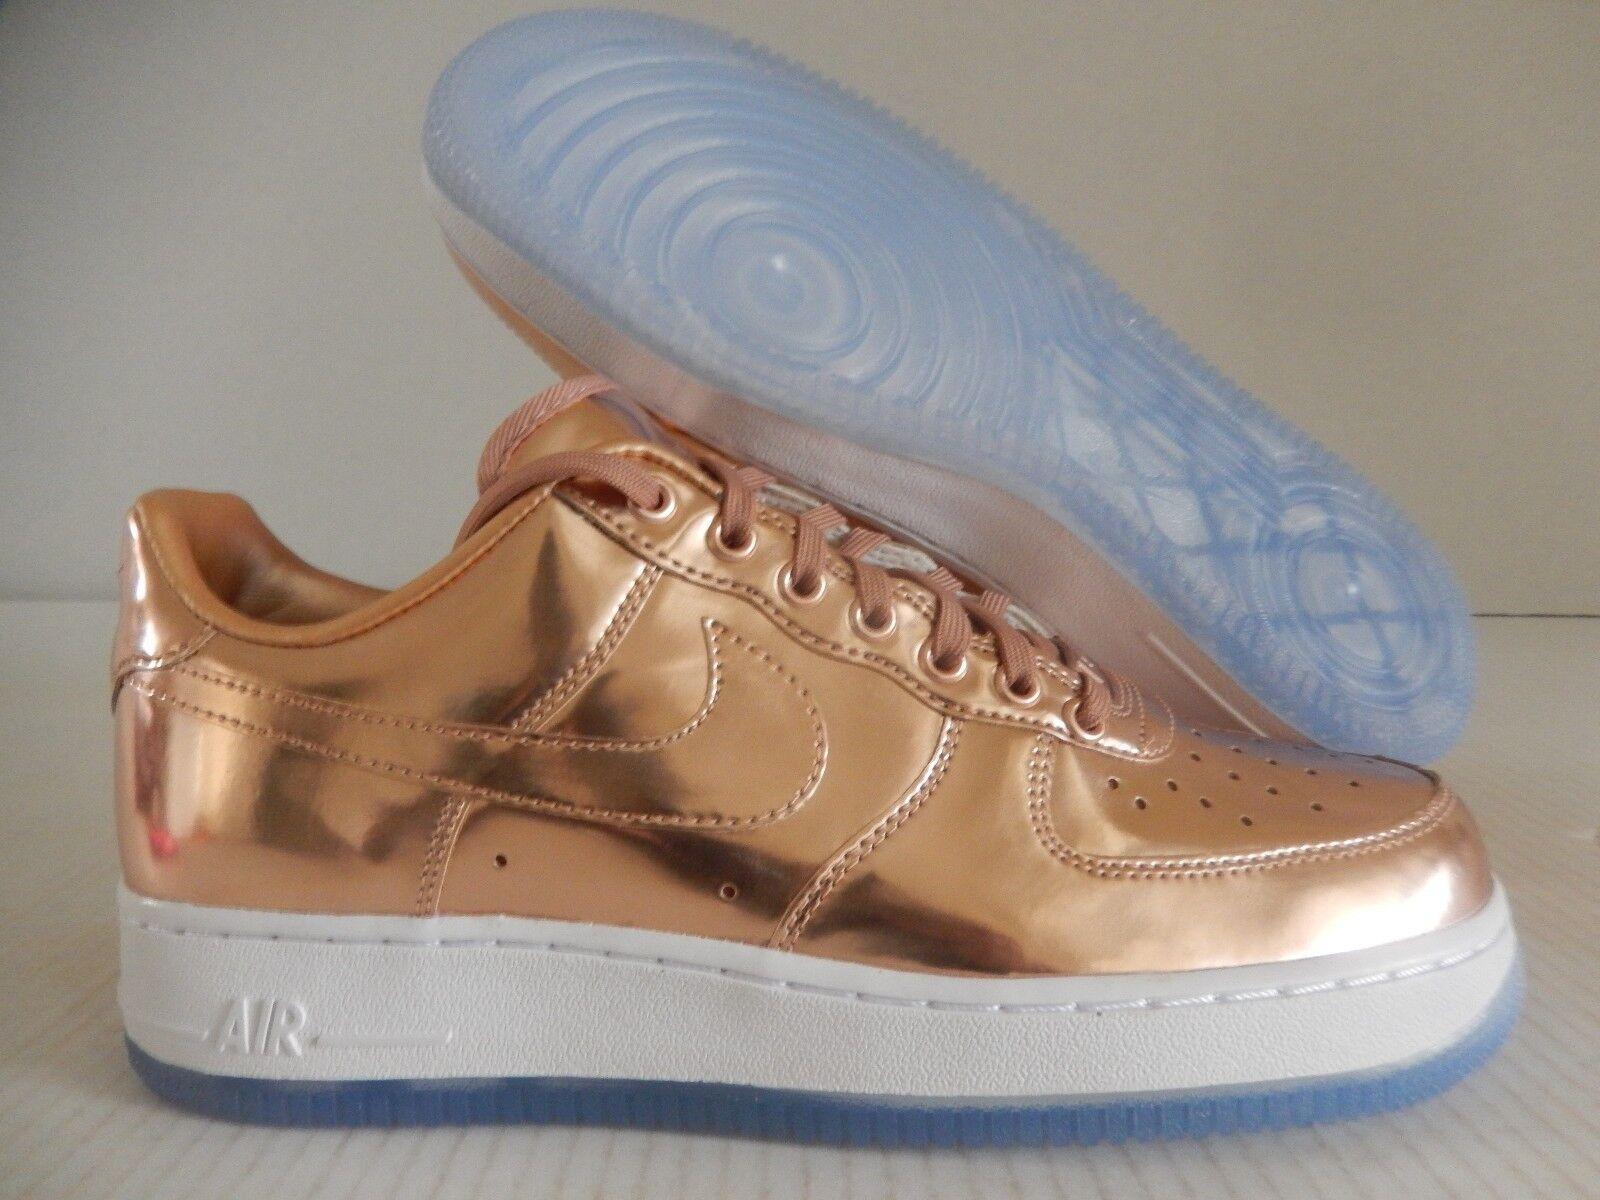 Mujeres Nike Force Air Force Nike 1 bajas ID Premium